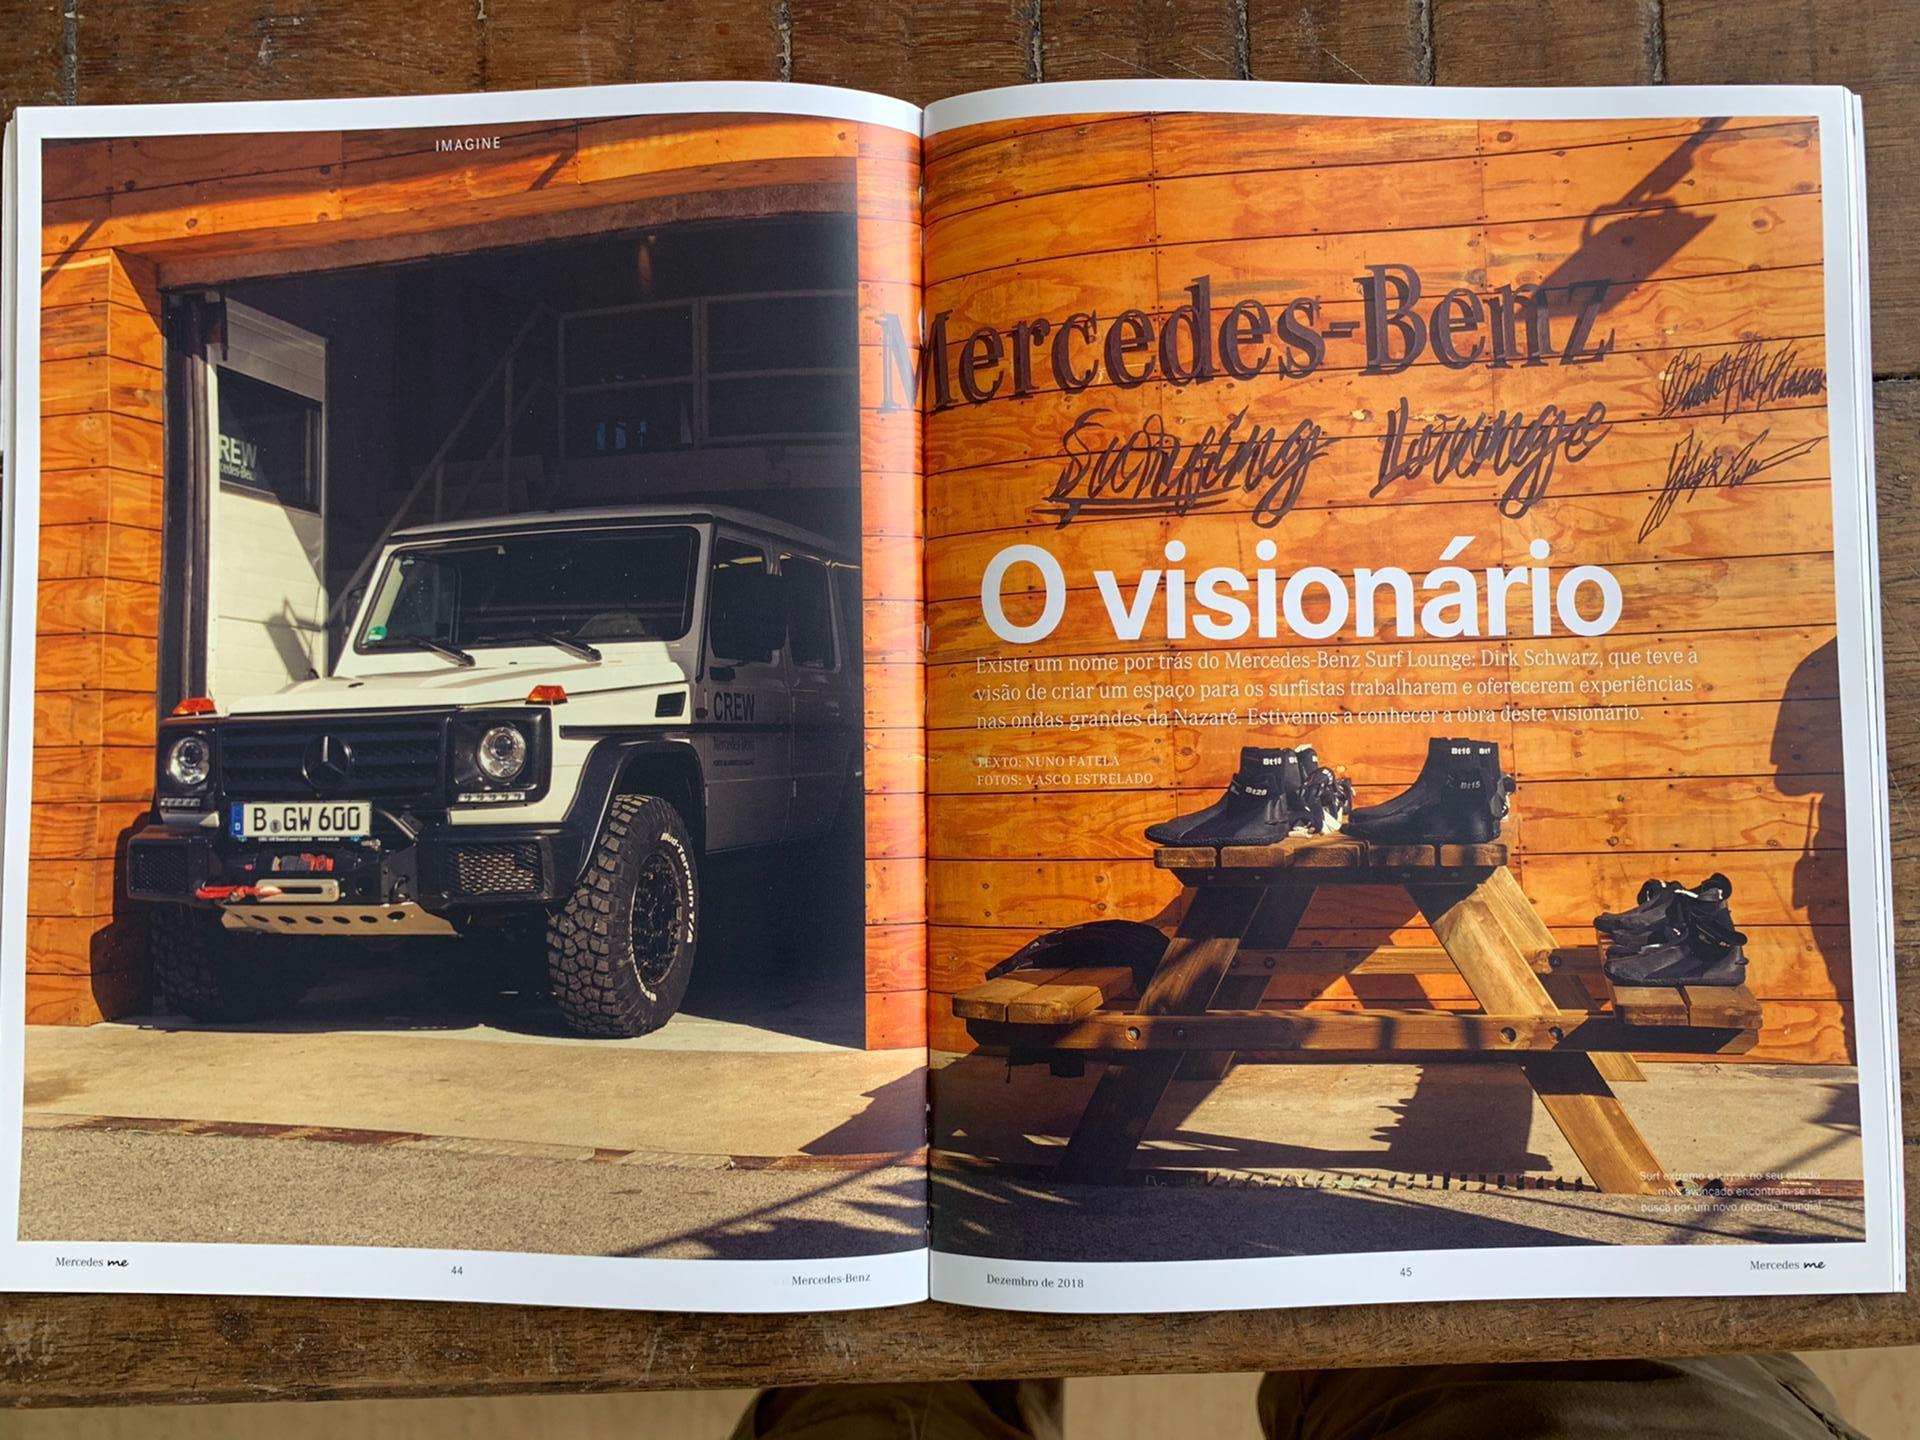 Ultimate Experience - Magazzine article about Nazaré - ME 2